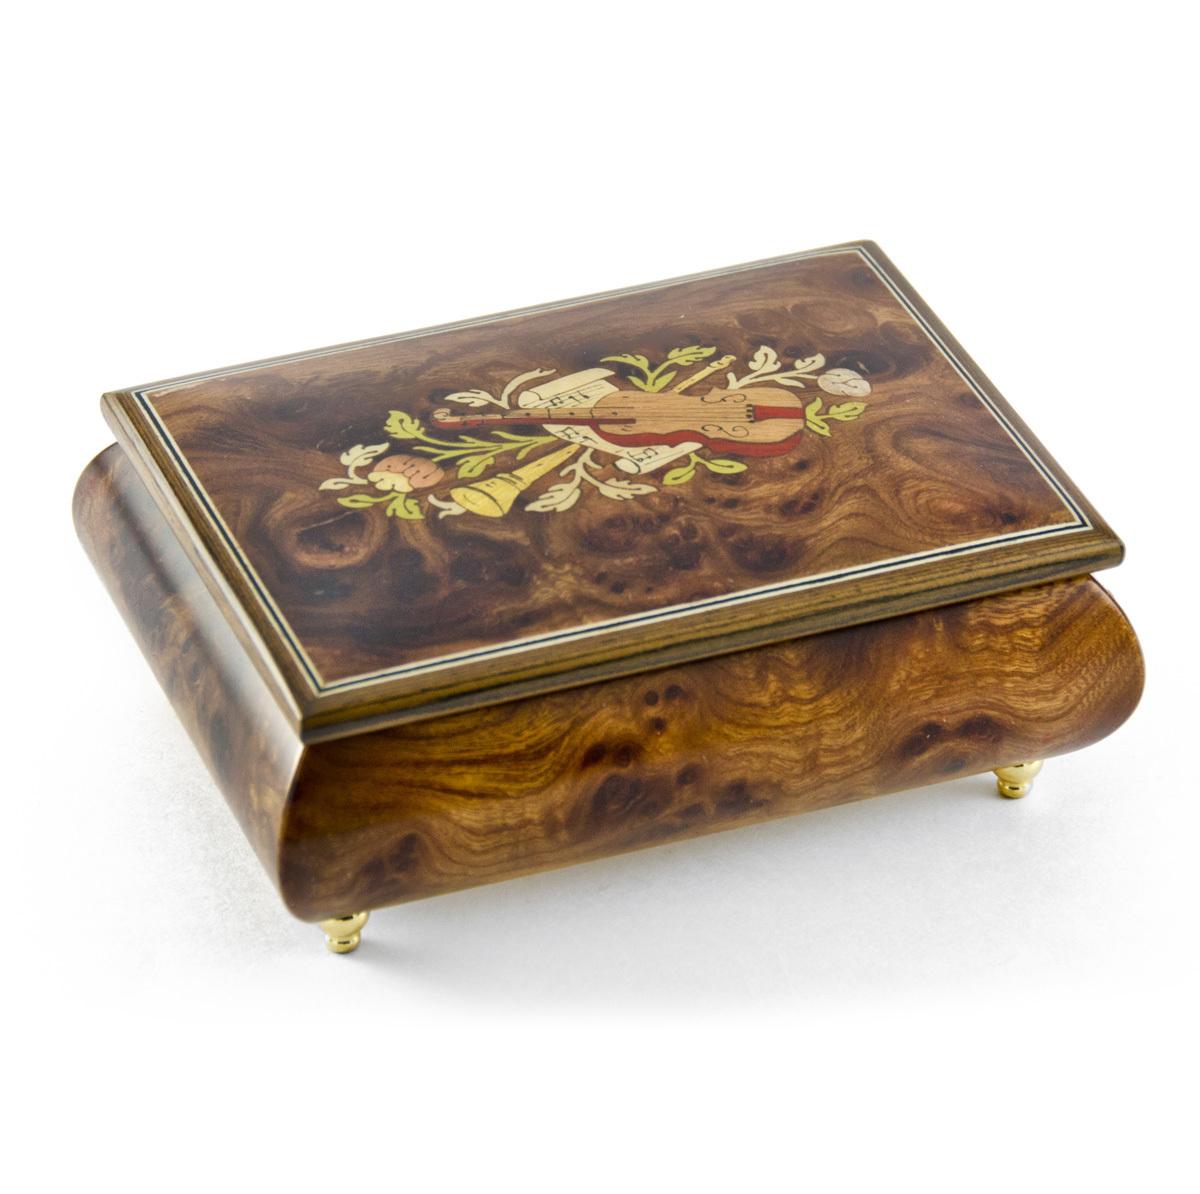 Charming Hand Made Walnut Instrument Theme Wood Inlay Music Box